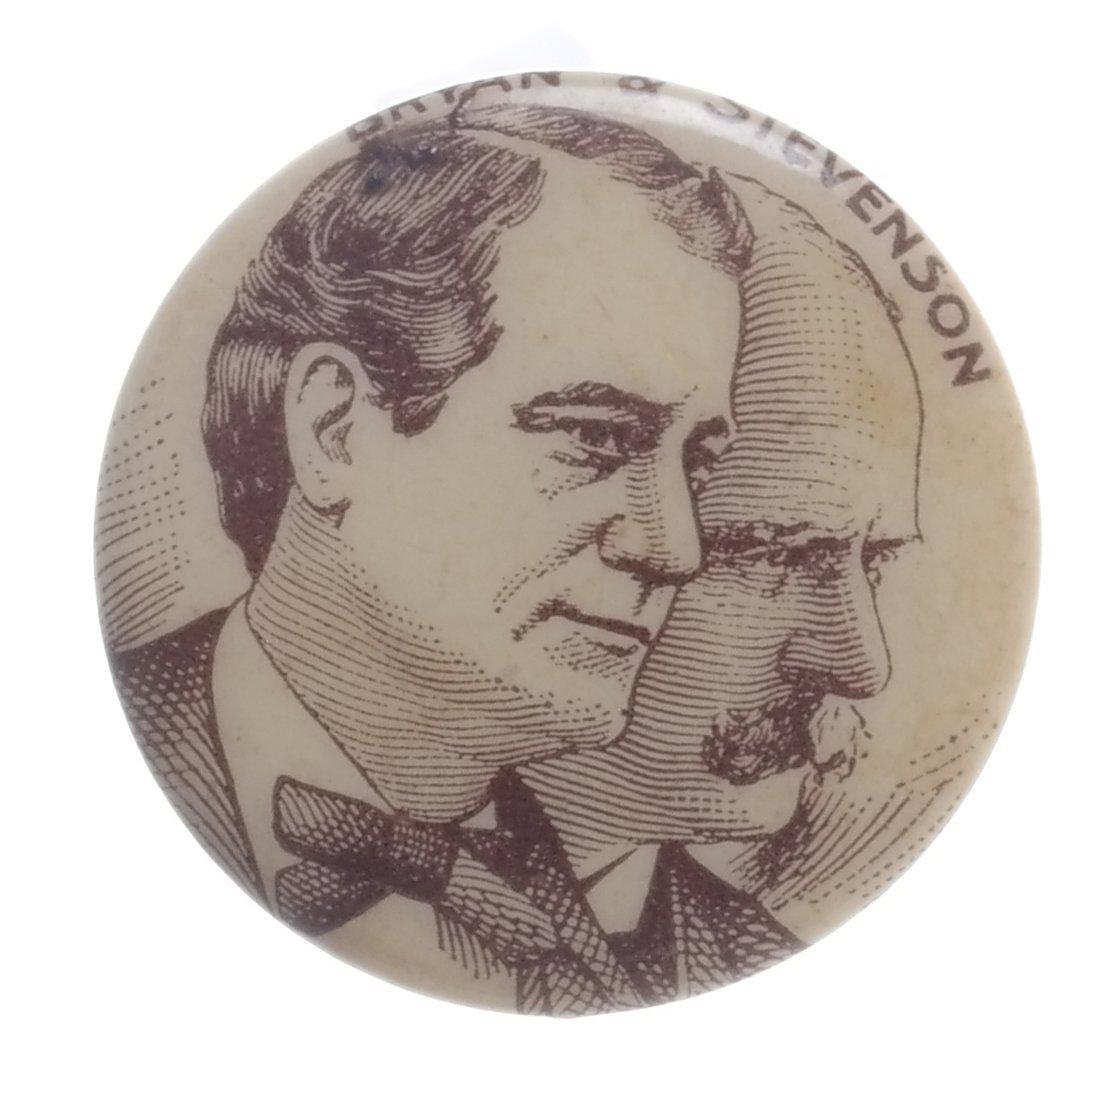 W.J. Bryan & A. Stevenson - 1900 Celluloid Stickpin